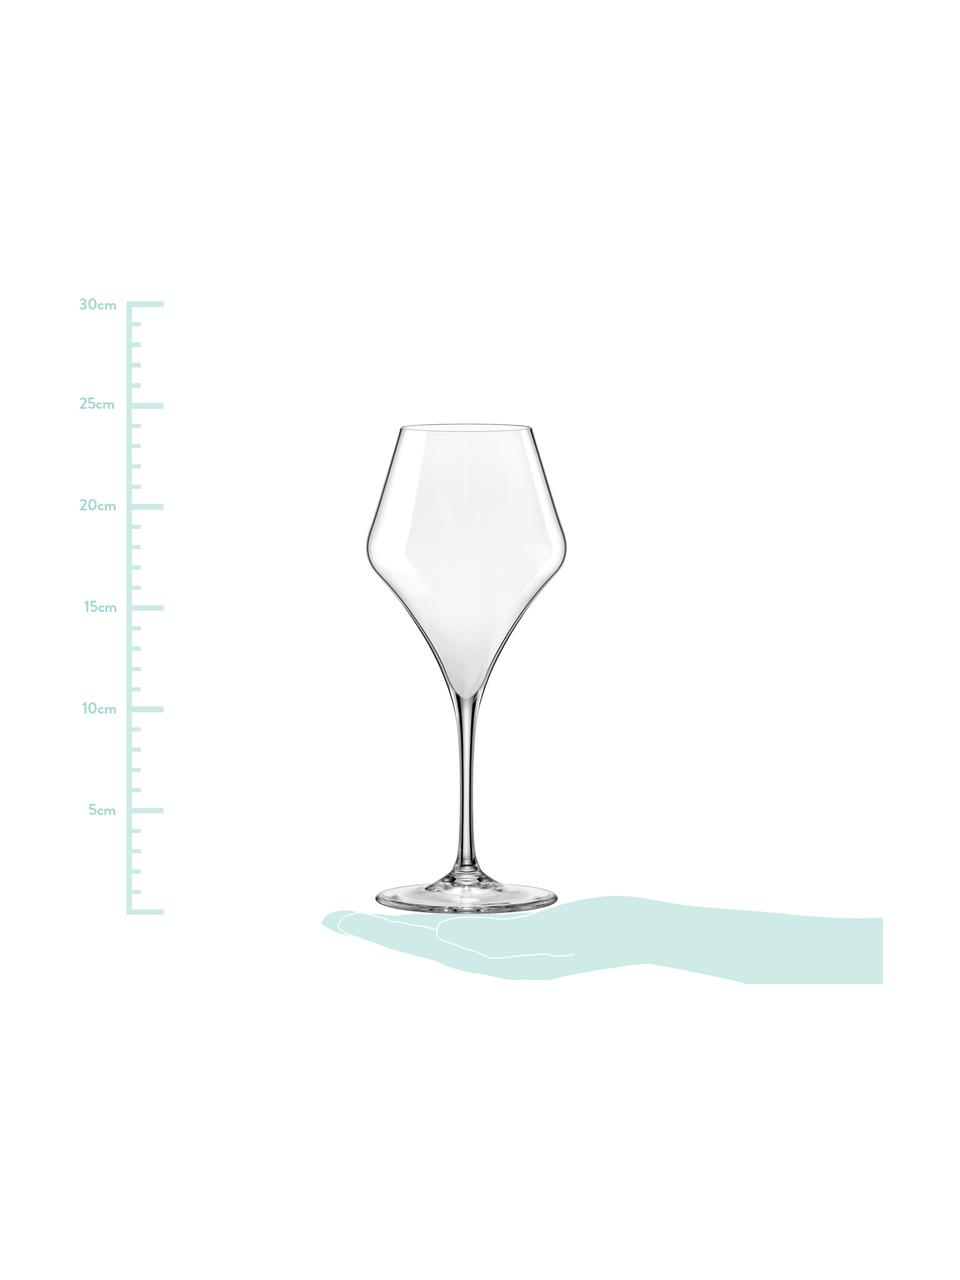 Bauchige Rotweingläser Aram, 6 Stück, Glas, Transparent, Ø 10 x H 24 cm